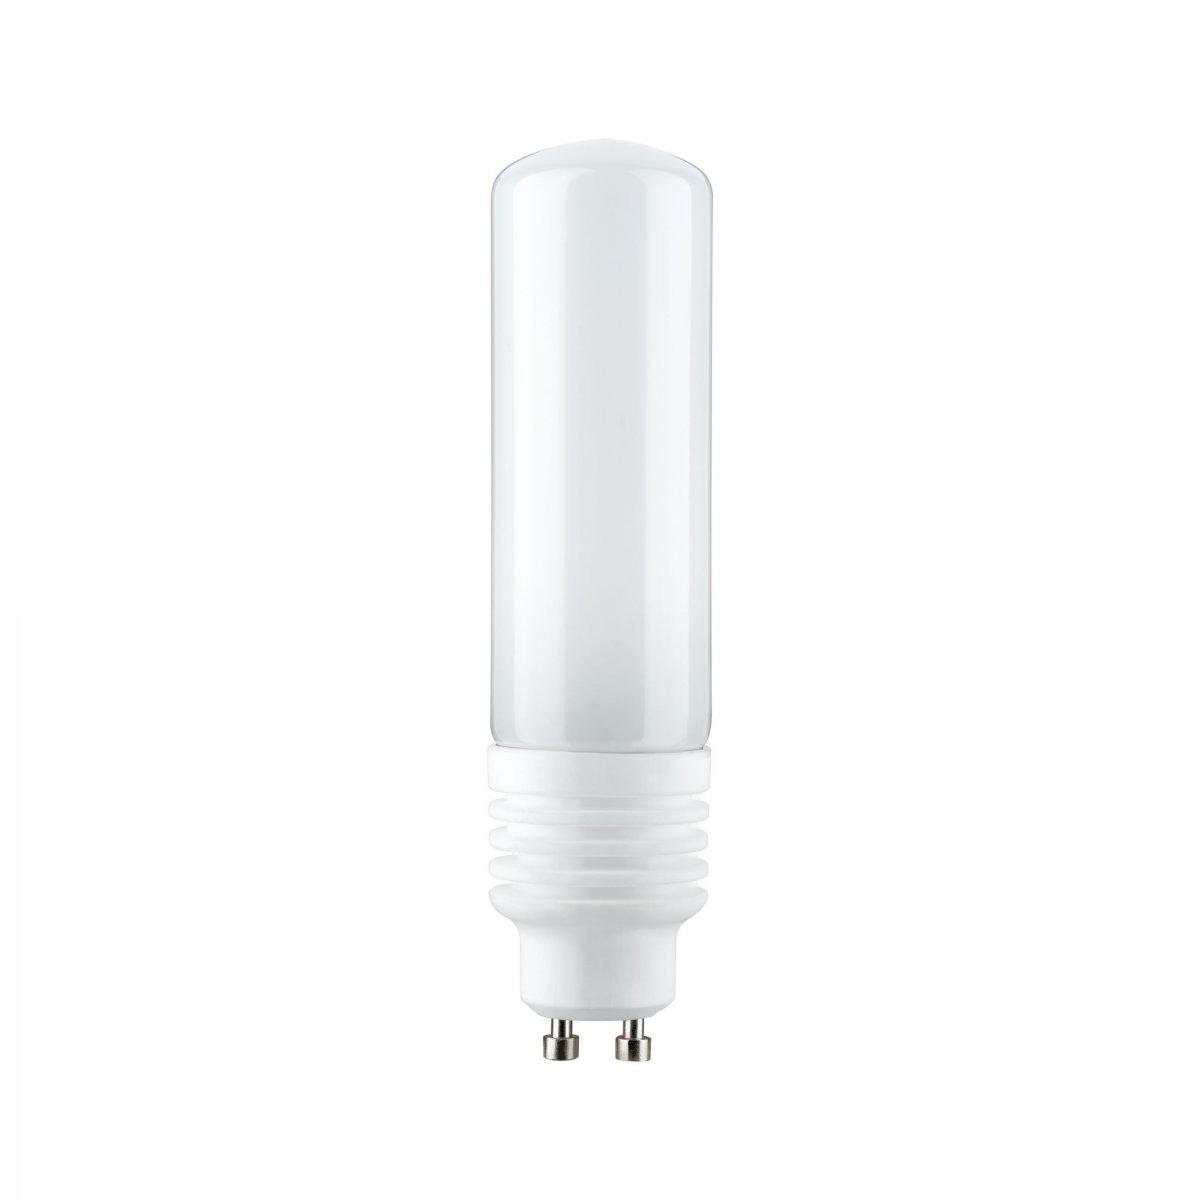 Jedi lighting idual led lamp w gu pack preisvergleich und